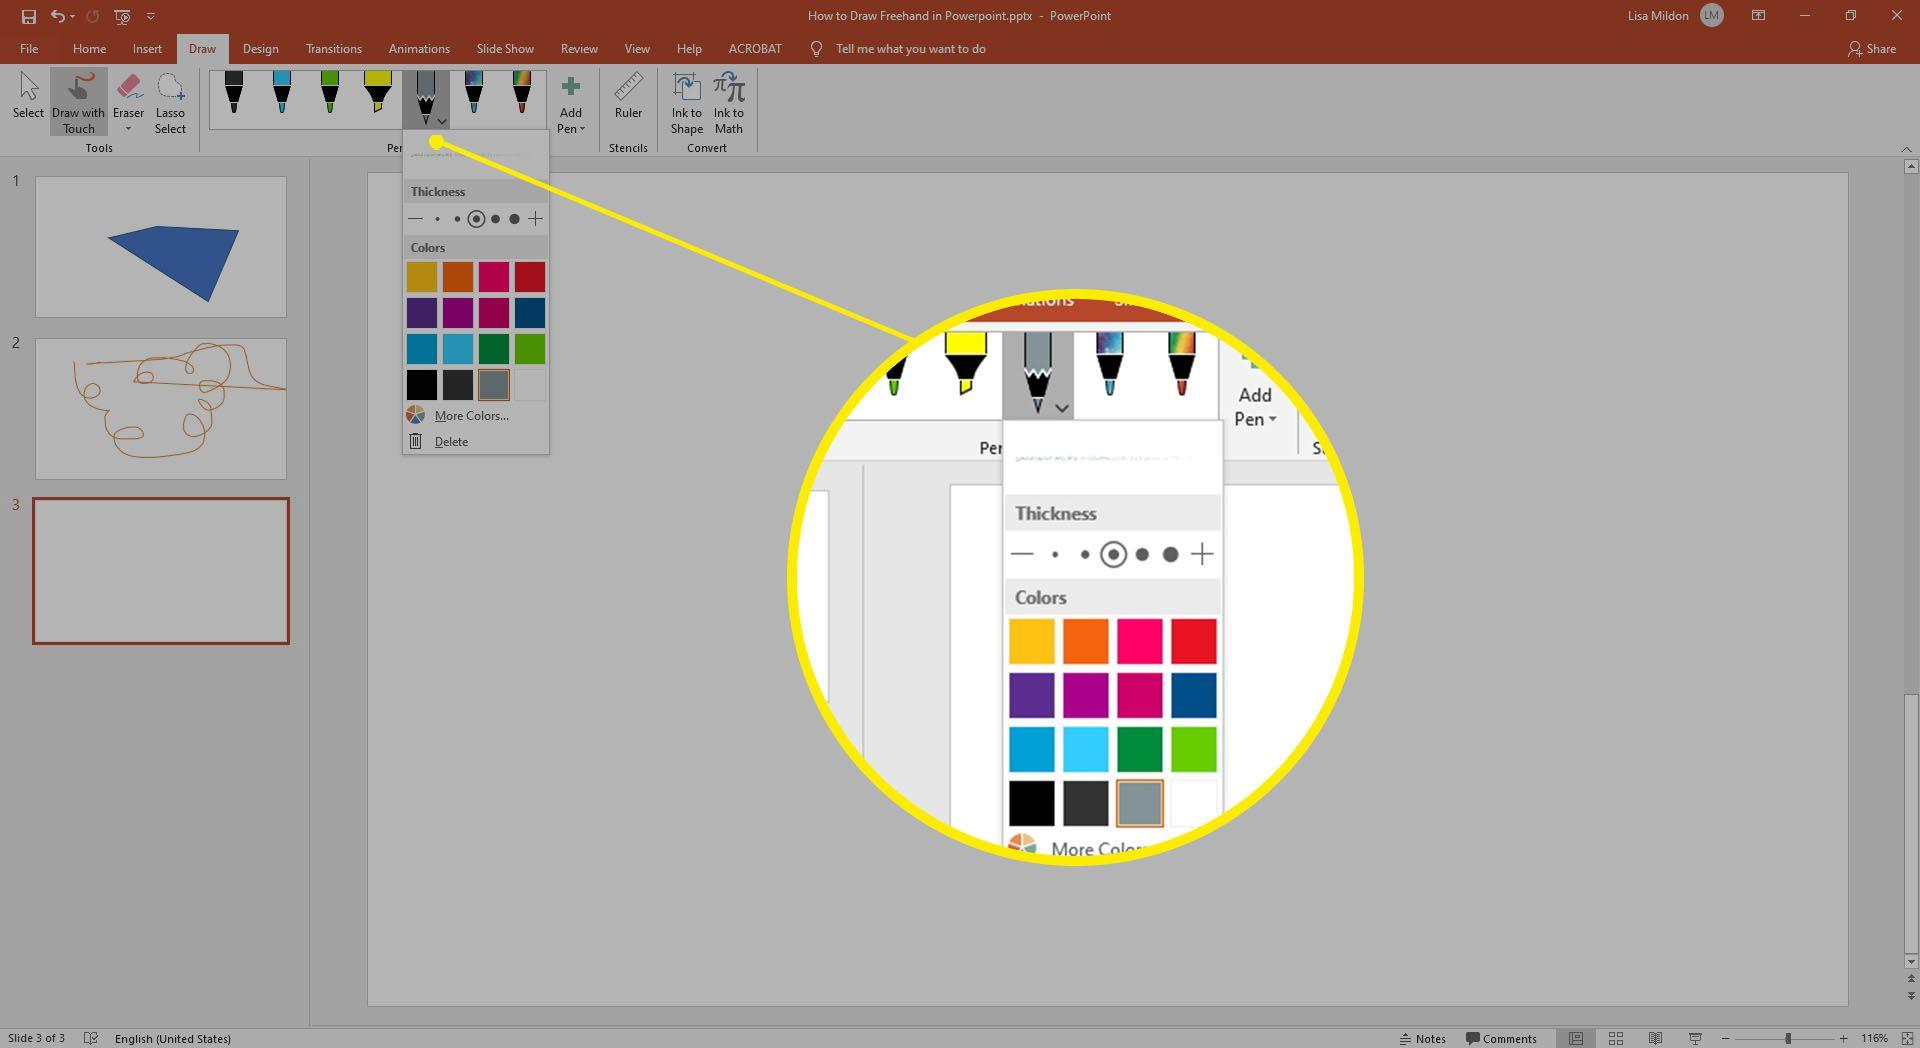 Pen formatting options inside the Pen tool in Powerpoint